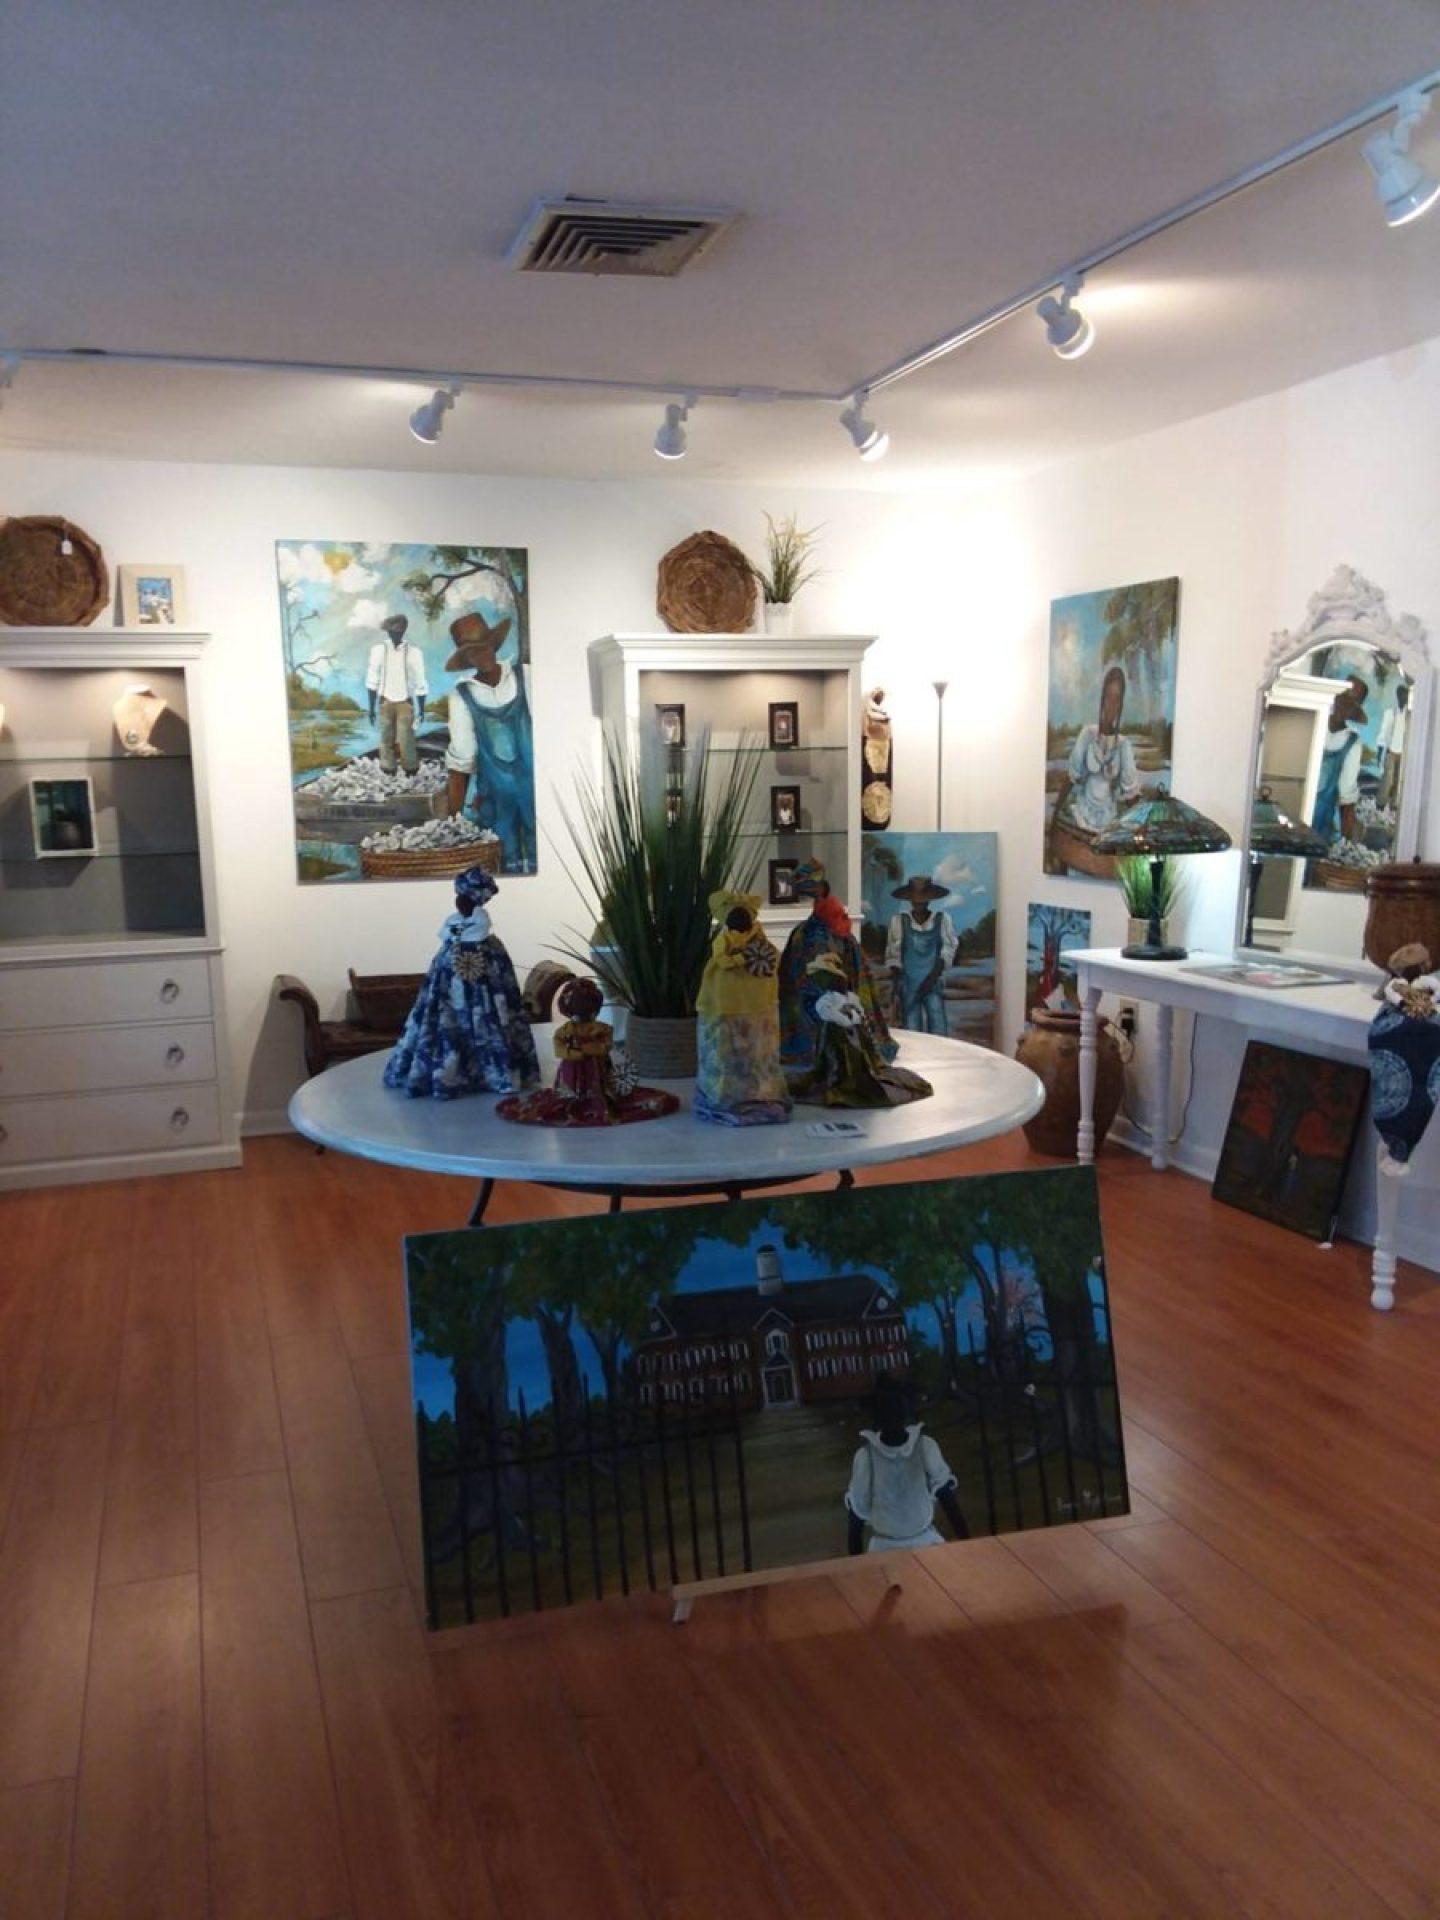 57504532_10215841320120777_1093150386073632768_o-1440x1920 International Cultural Gullah Artist Sonja Griffin Evans Unveils Newest Art Studio